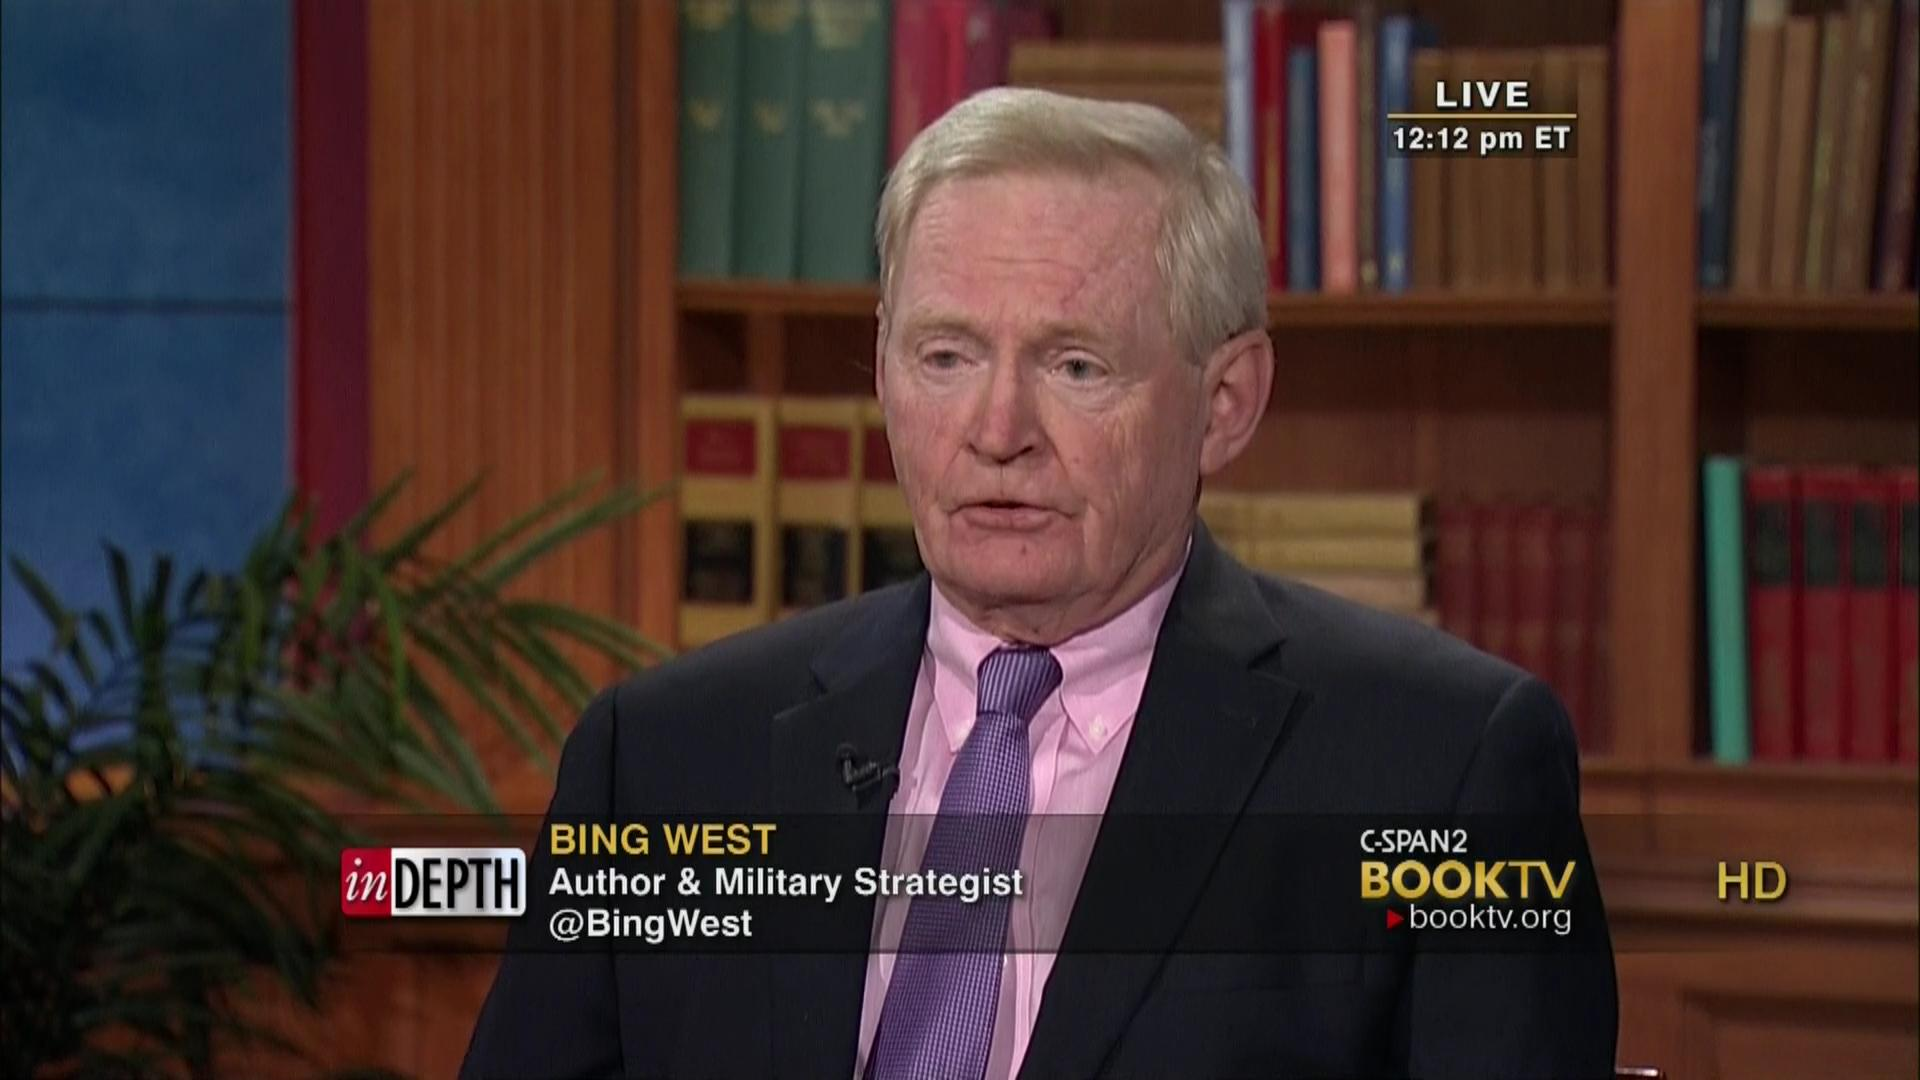 Bing West